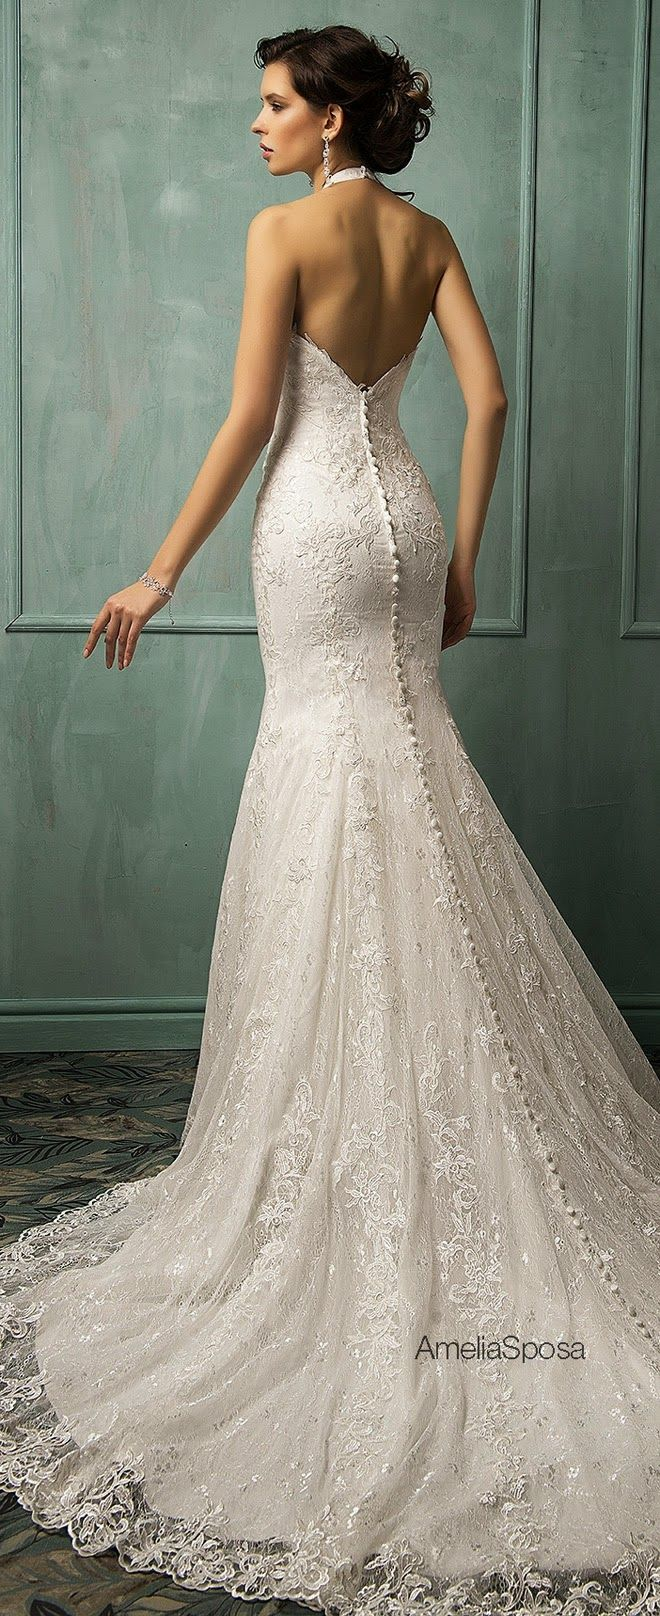 Amelia sposa wedding dresses wedding and bachelorette party